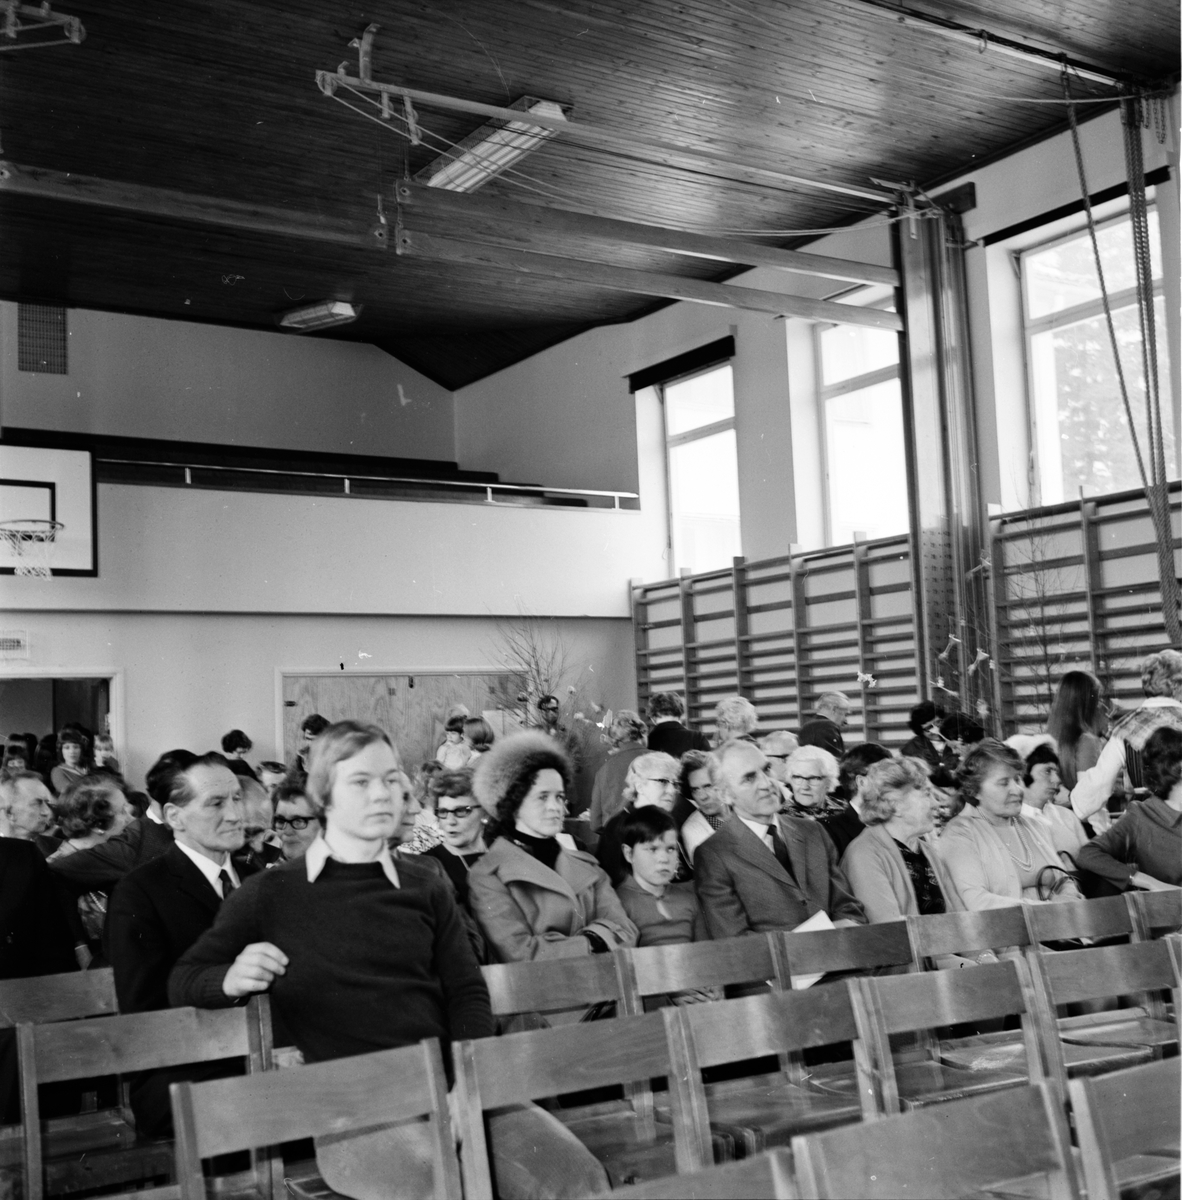 Lutherhjälpens öppet hus på Nytorp, 11 Mars 1973